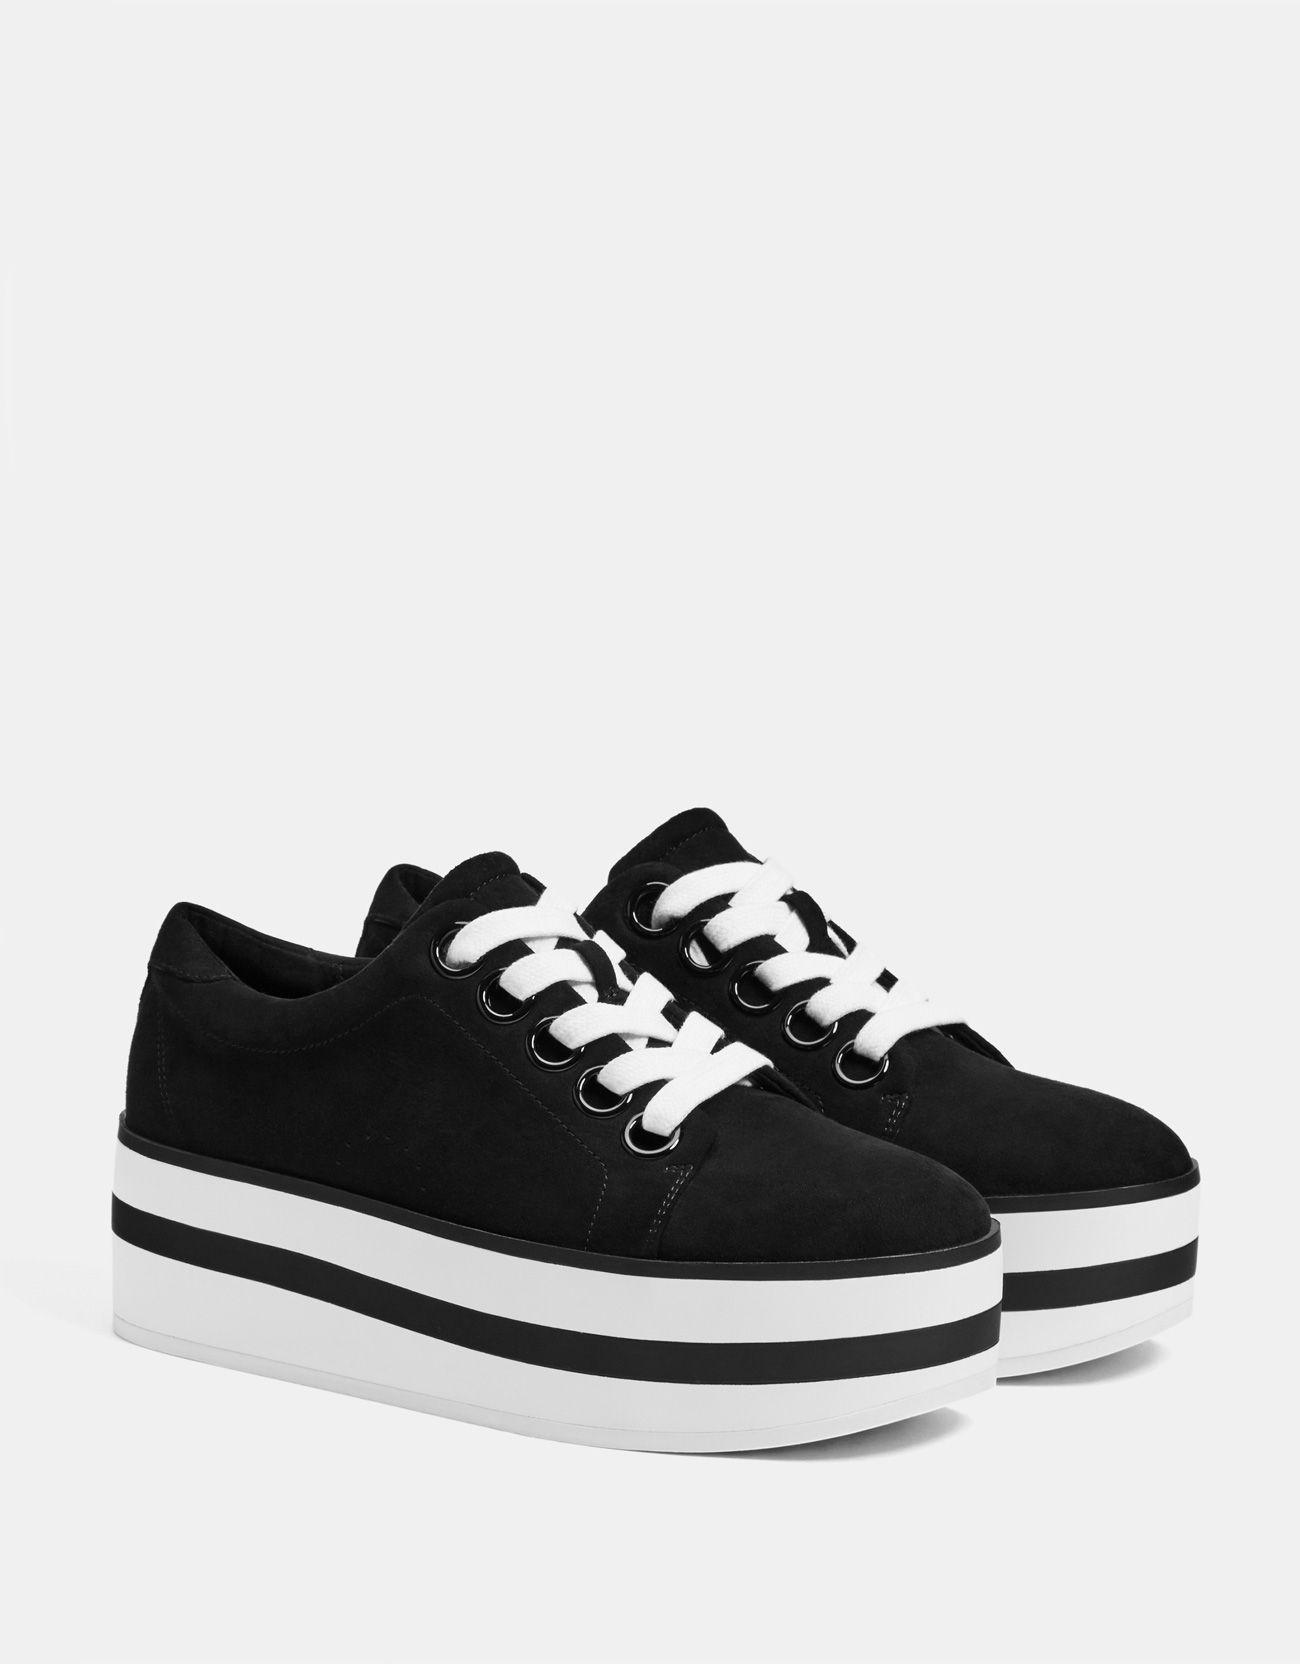 439c0d5366b38 Two-toned platform slip-ons v roku 2019 | s | Sneakers, Fashion ...